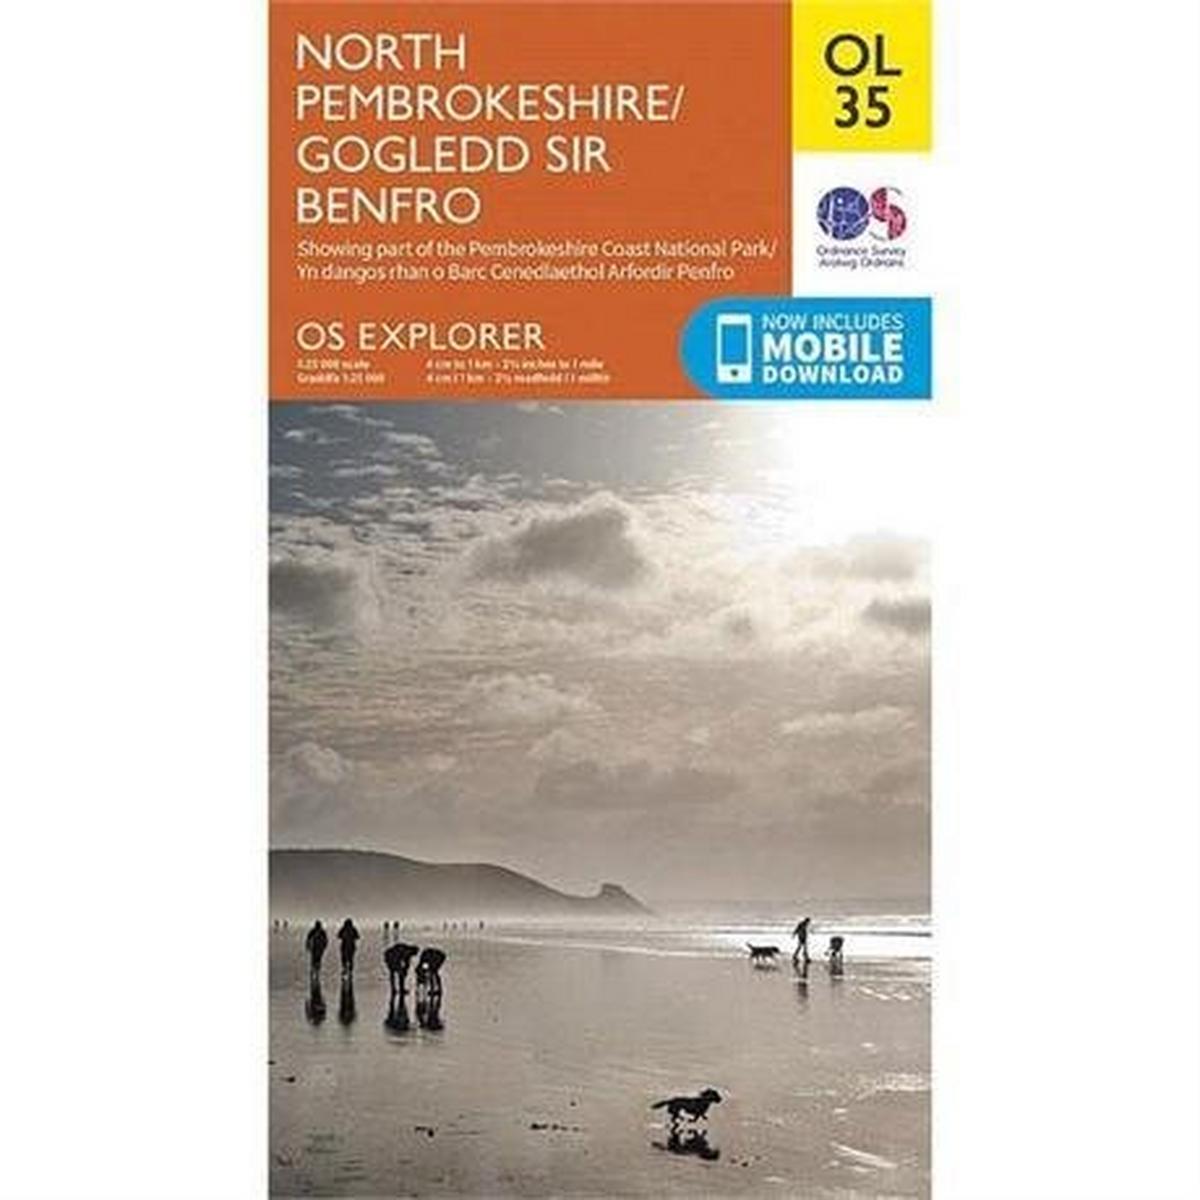 Ordnance Survey OS Explorer Map OL35 North Pembrokeshire / Gogledd Sir Benfro